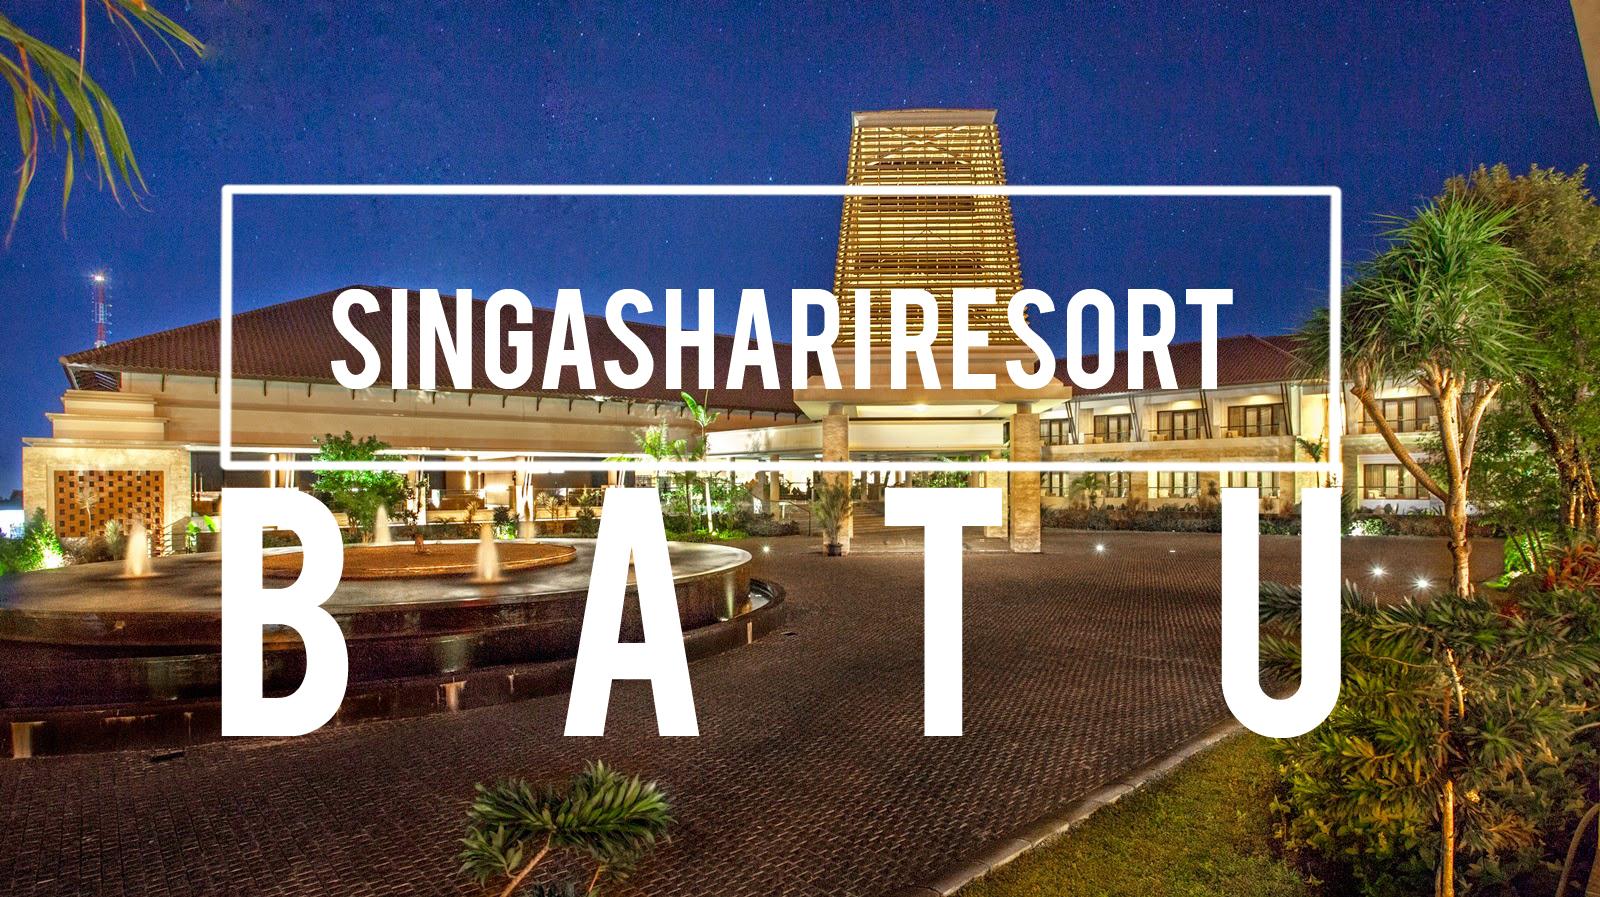 Daftar Harga Hotel Di Batu Malang Penginapan Murah